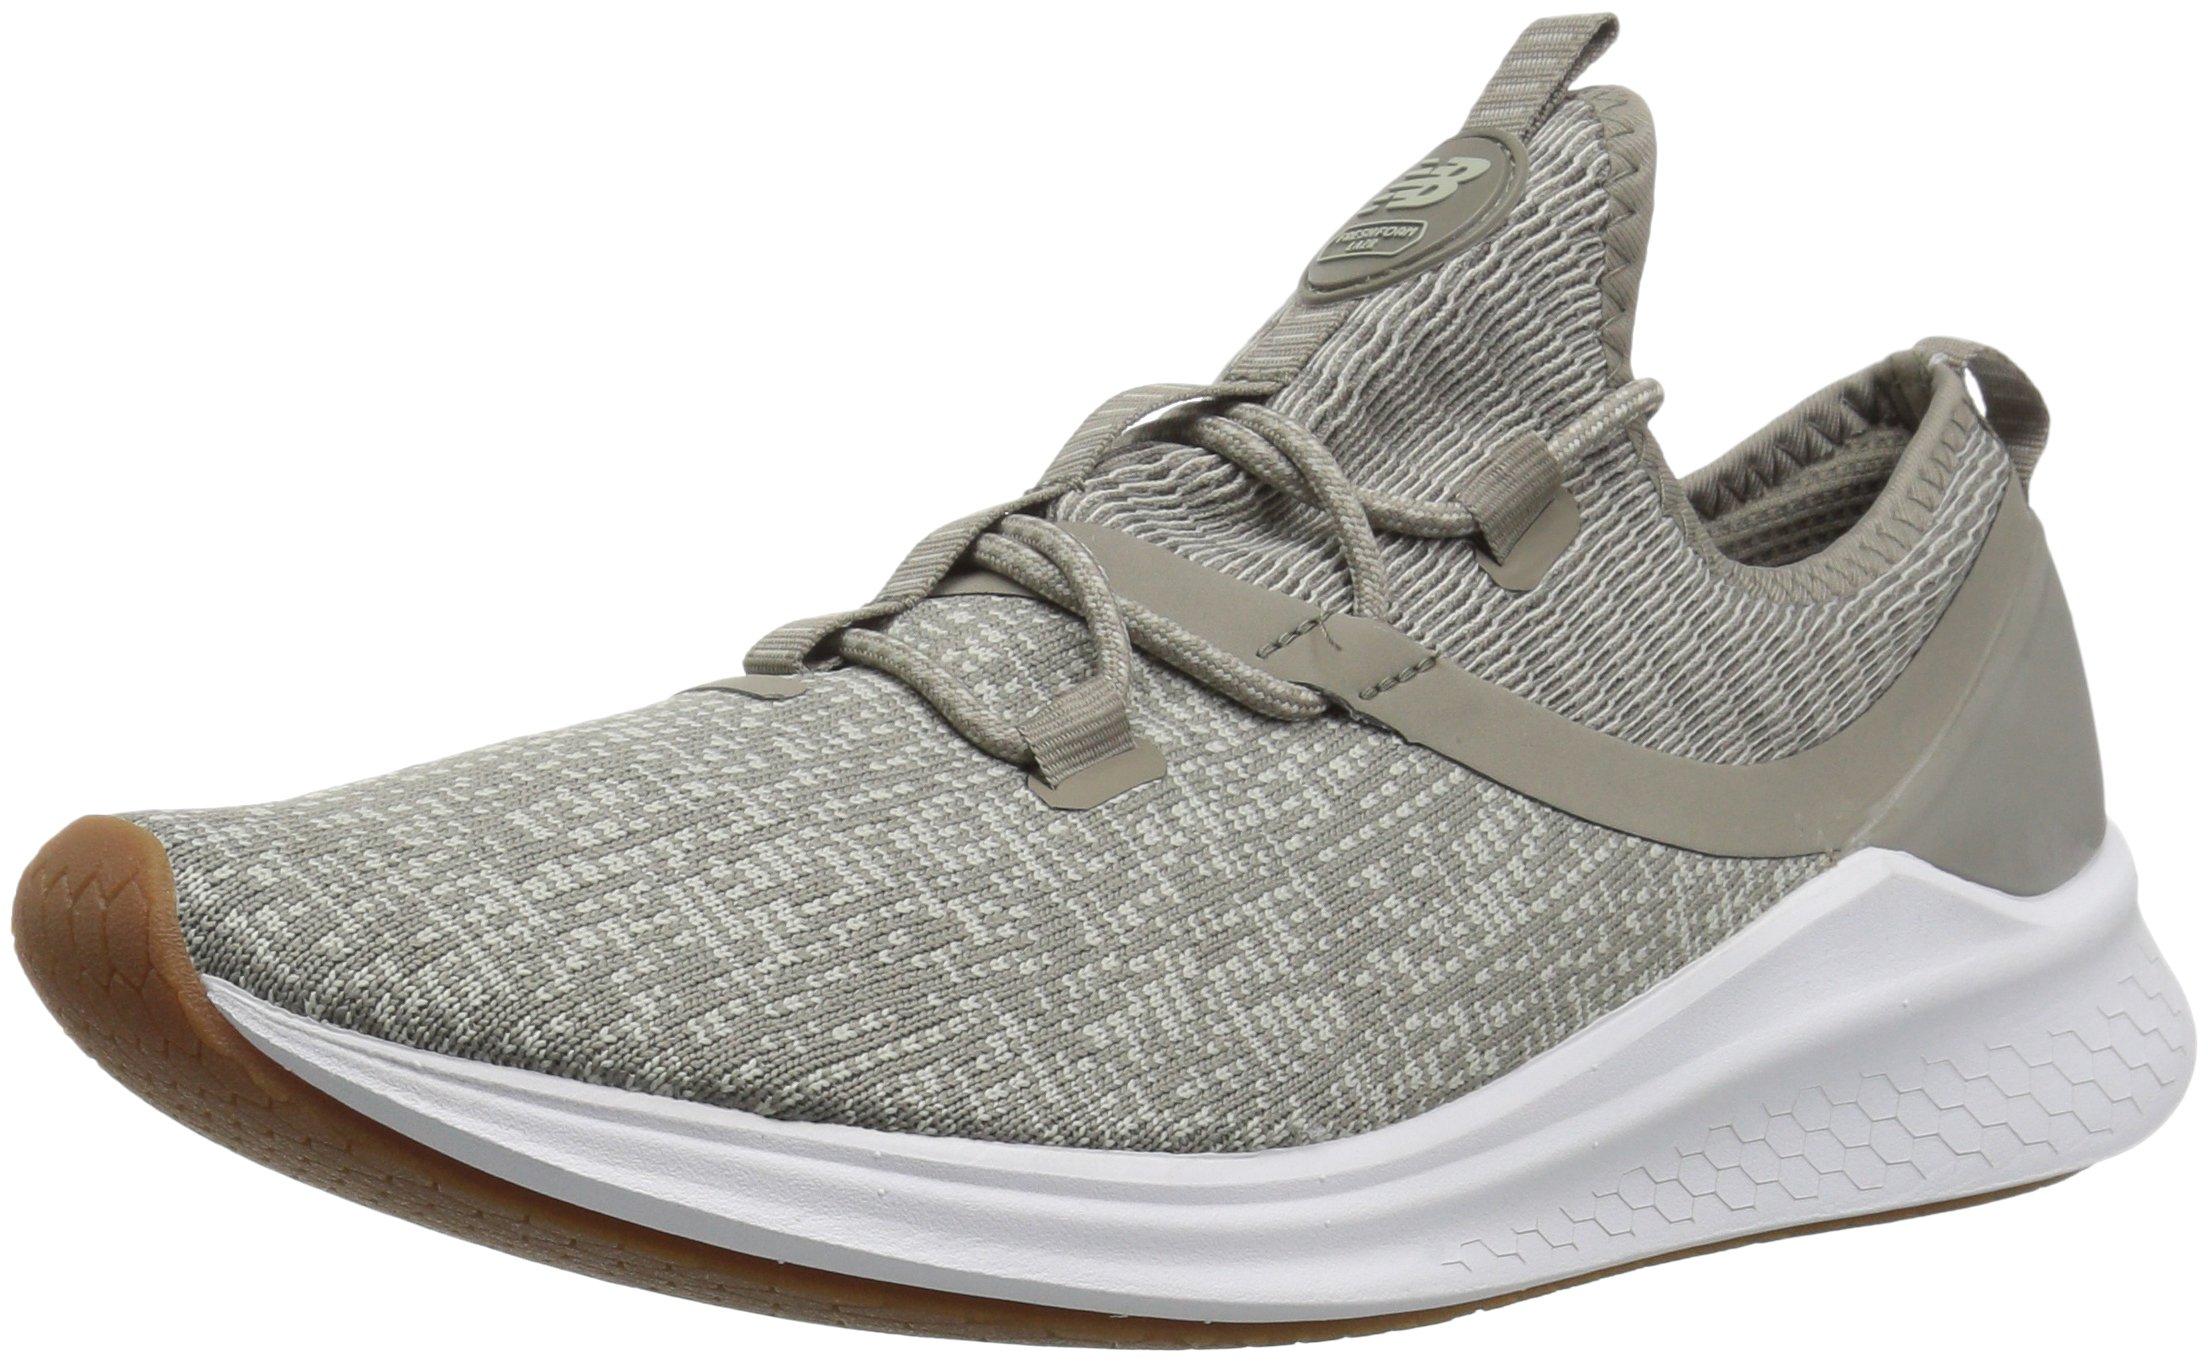 New Balance Men's Fresh Foam Lazr v1 Sport Running Shoe, Military Urban Grey/Stone Grey/White Munsell, 11.5 D US